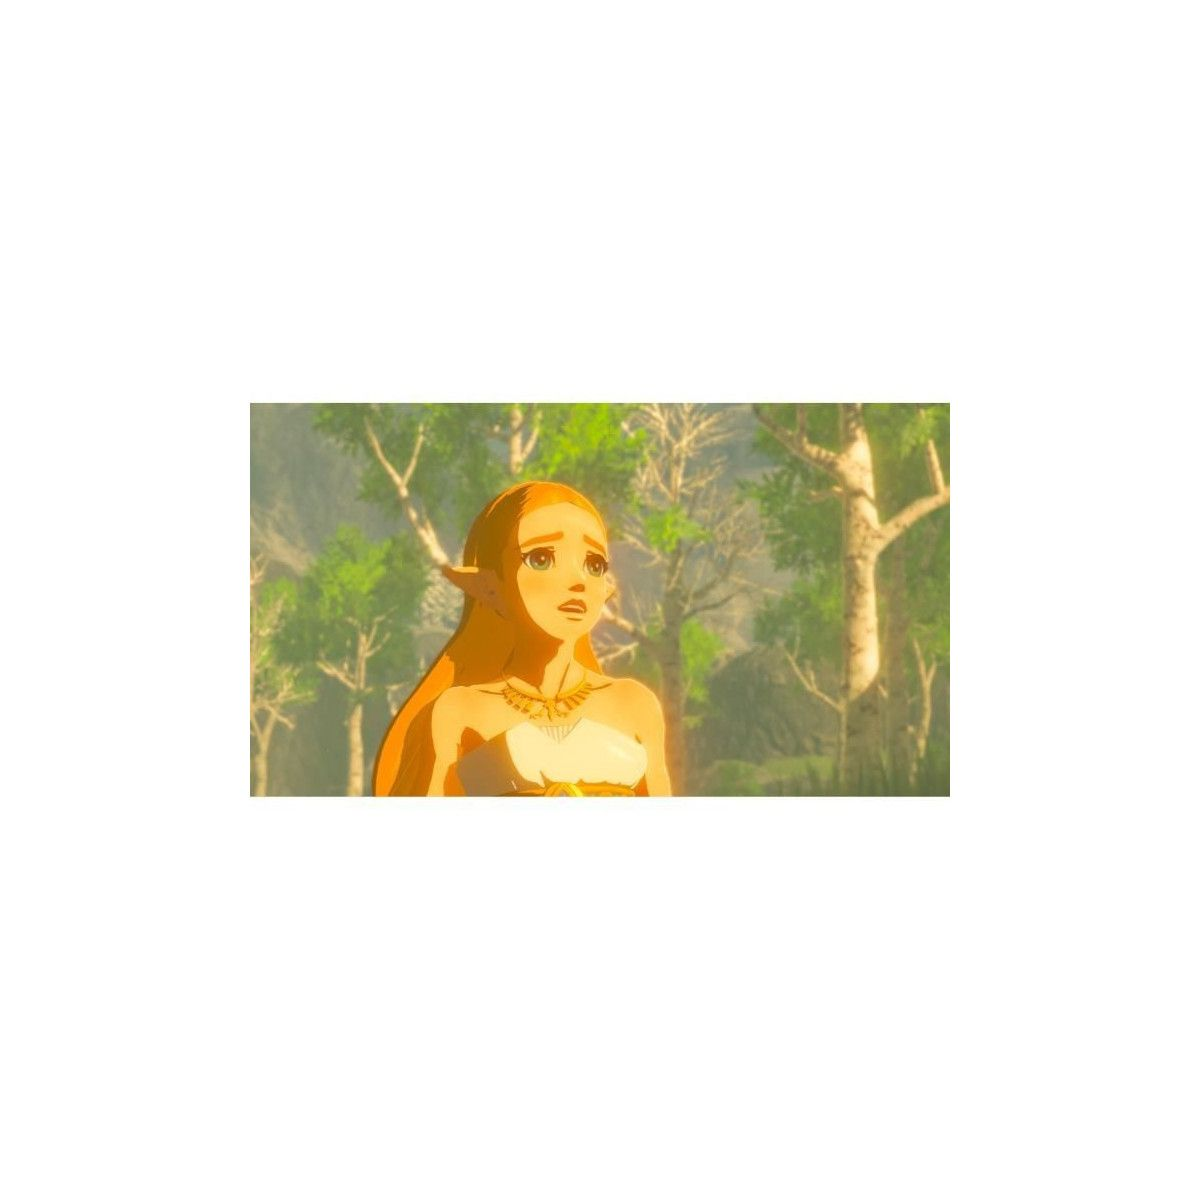 Acheter The Legend Of Zelda Breath Of The Wild Manette